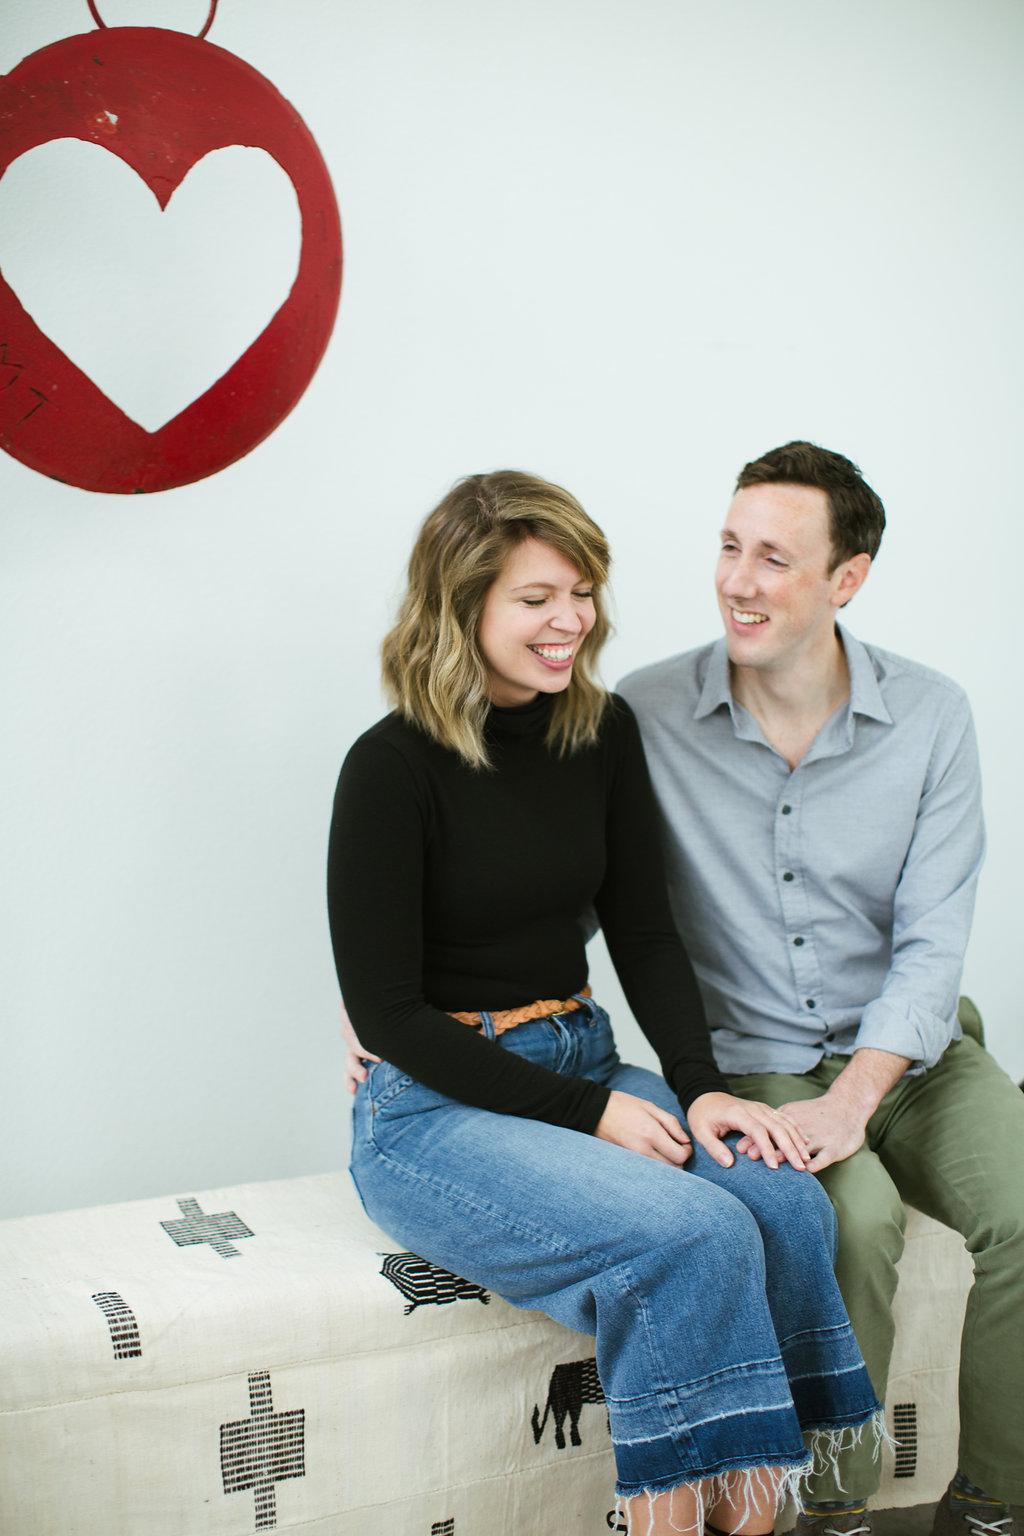 Paige-Newton-Photography-Couple-Studio-Session-Austin-Engagement-Session0001.jpg